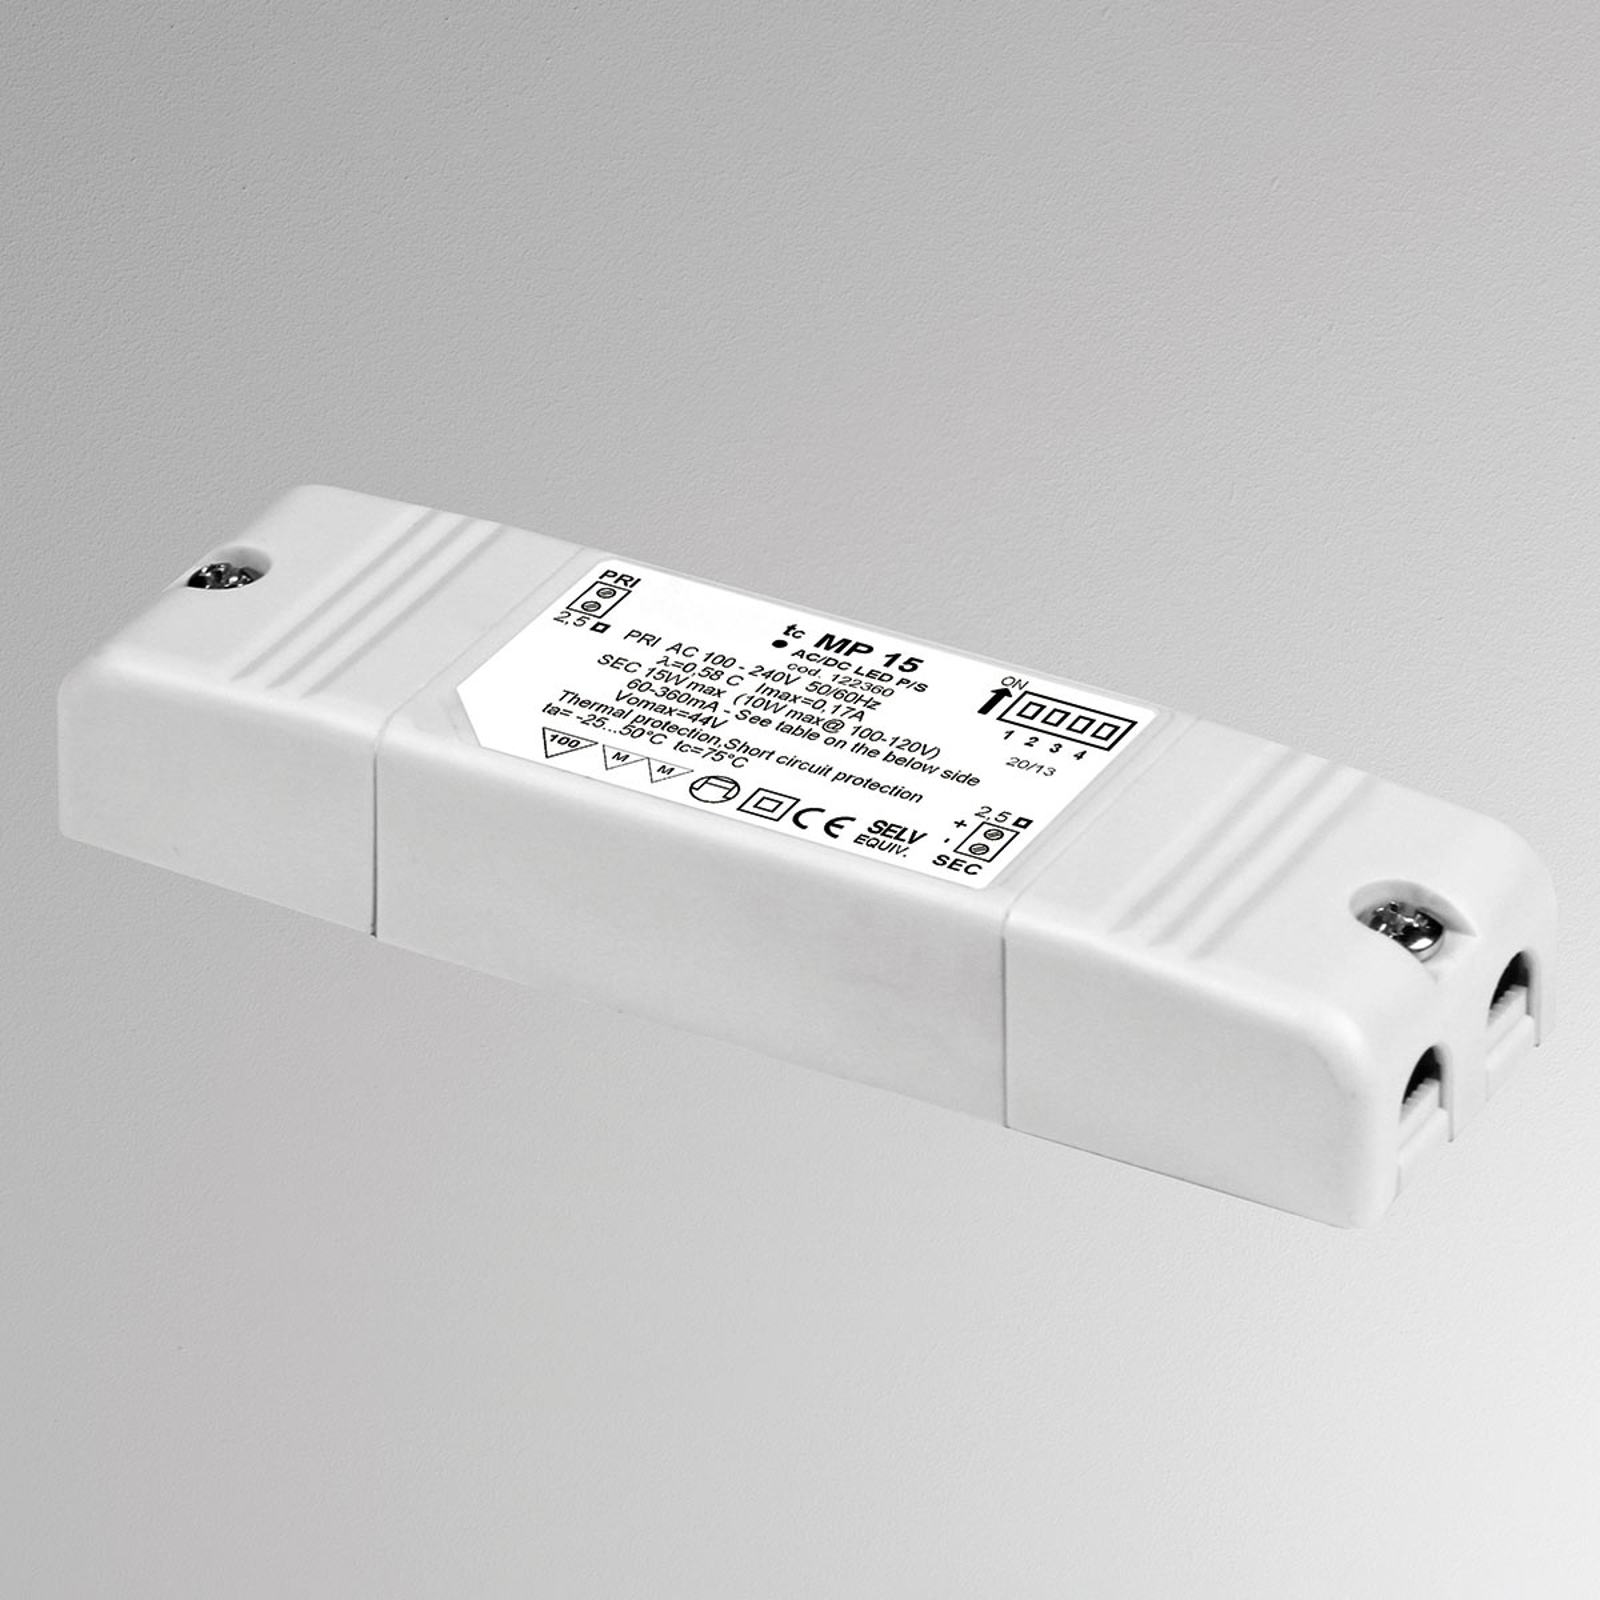 MP15 LED-konverter, justerbar, ikke dimbar